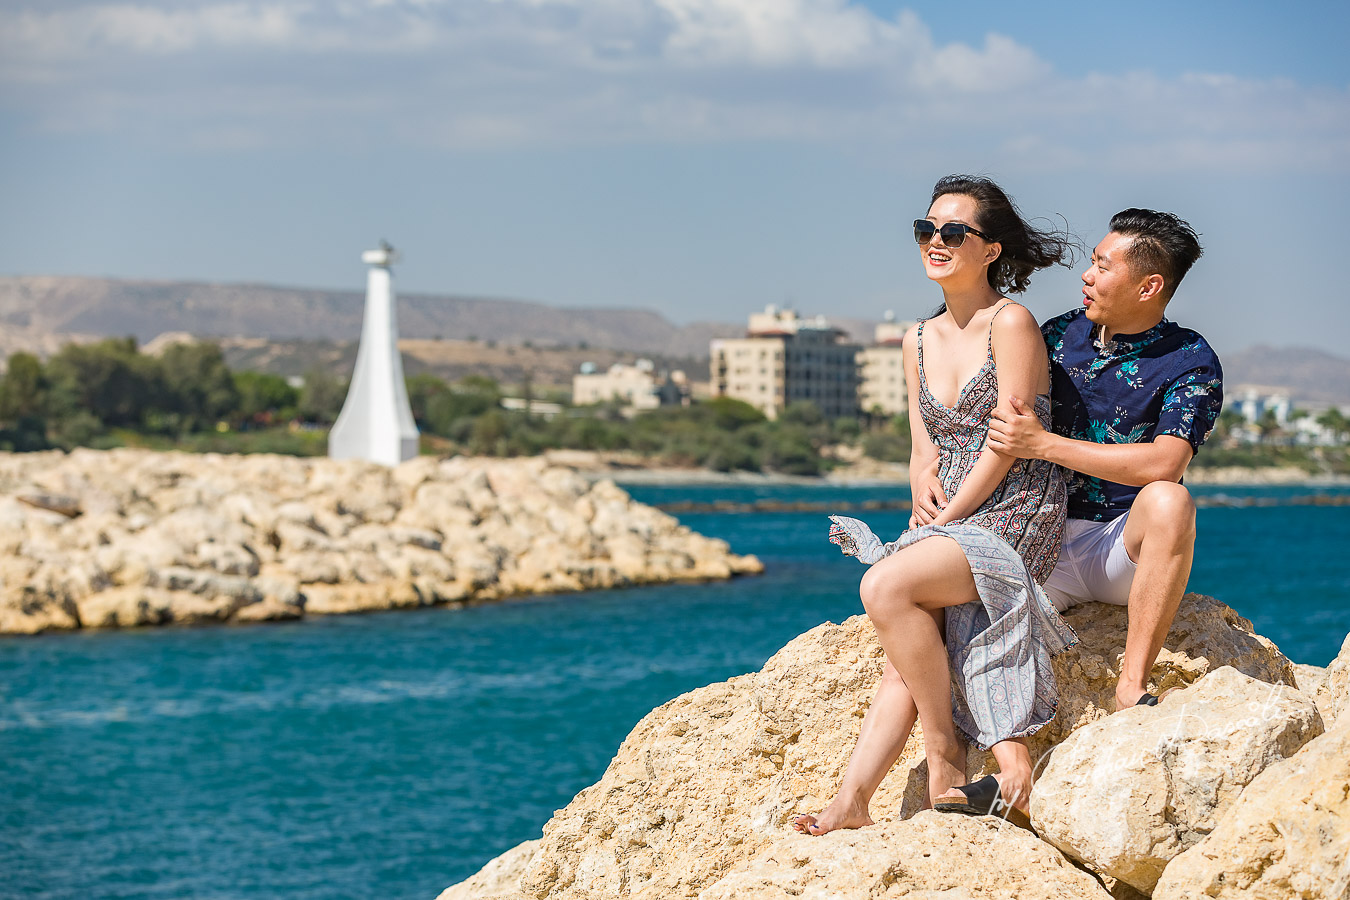 Beautiful moments captured by Cristian Dascalu in Larnaca, Cyprus.